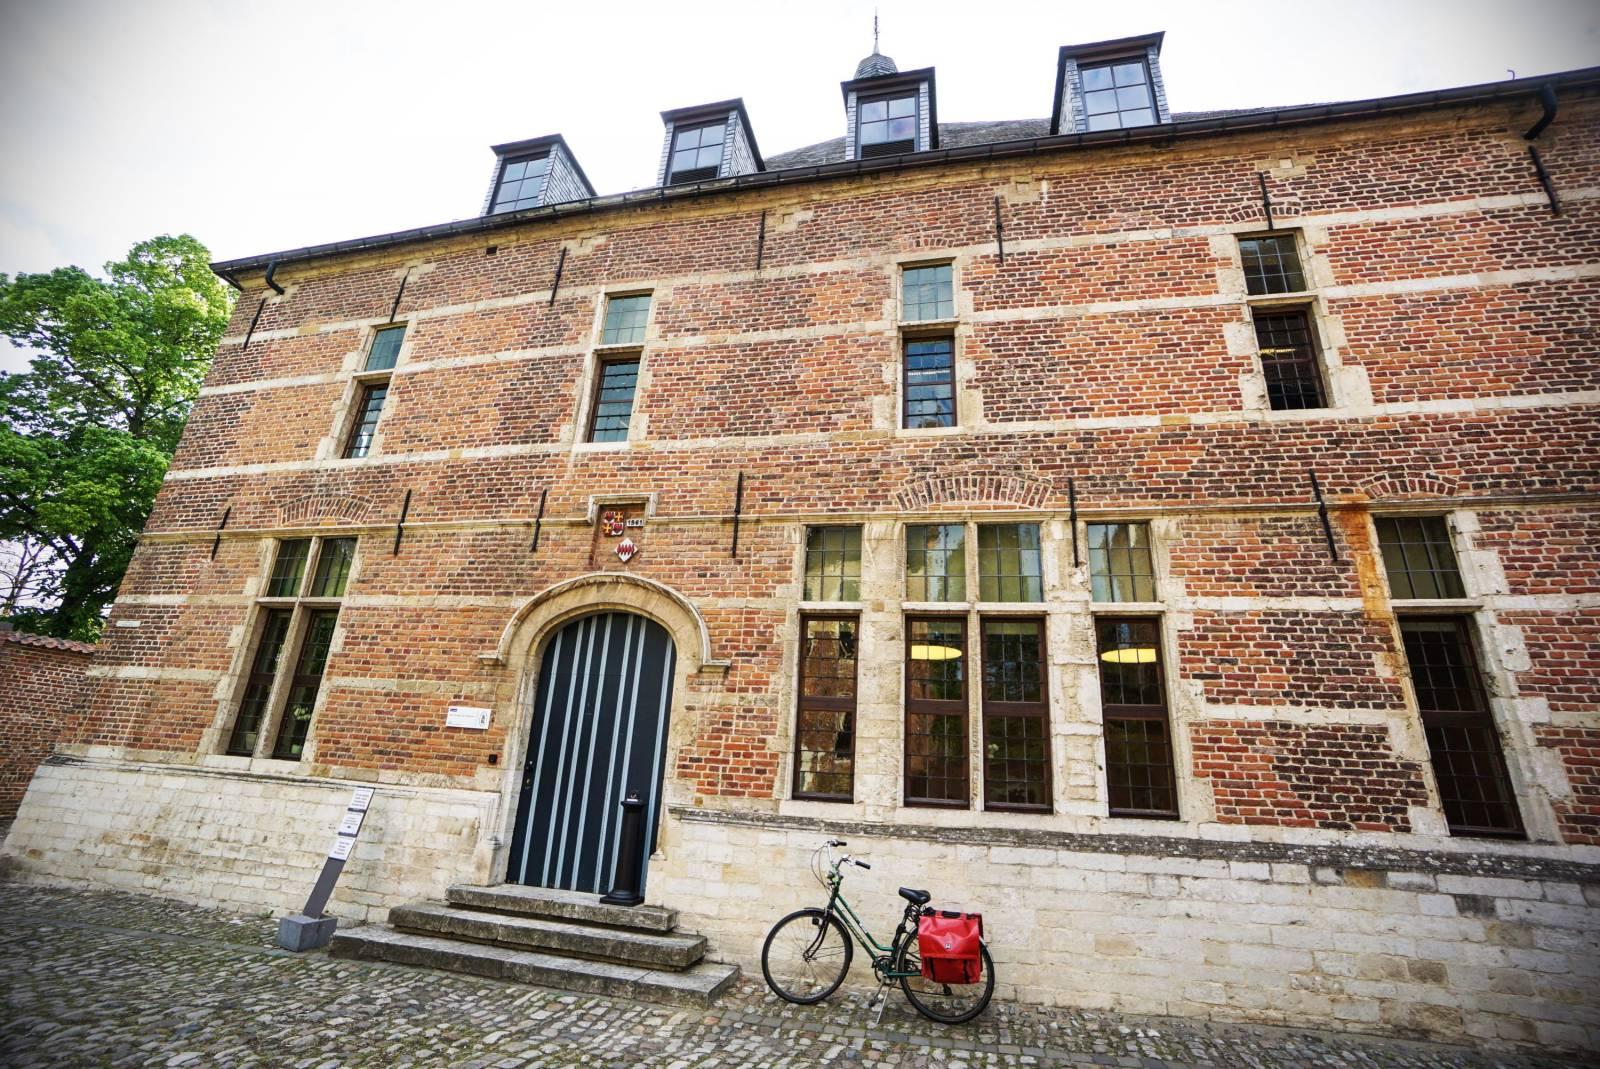 Faculty Club - Feestzaal te Leuven - Eventlocatie - GARDEN LOUNGE MEI 2019 - House of Events - 3